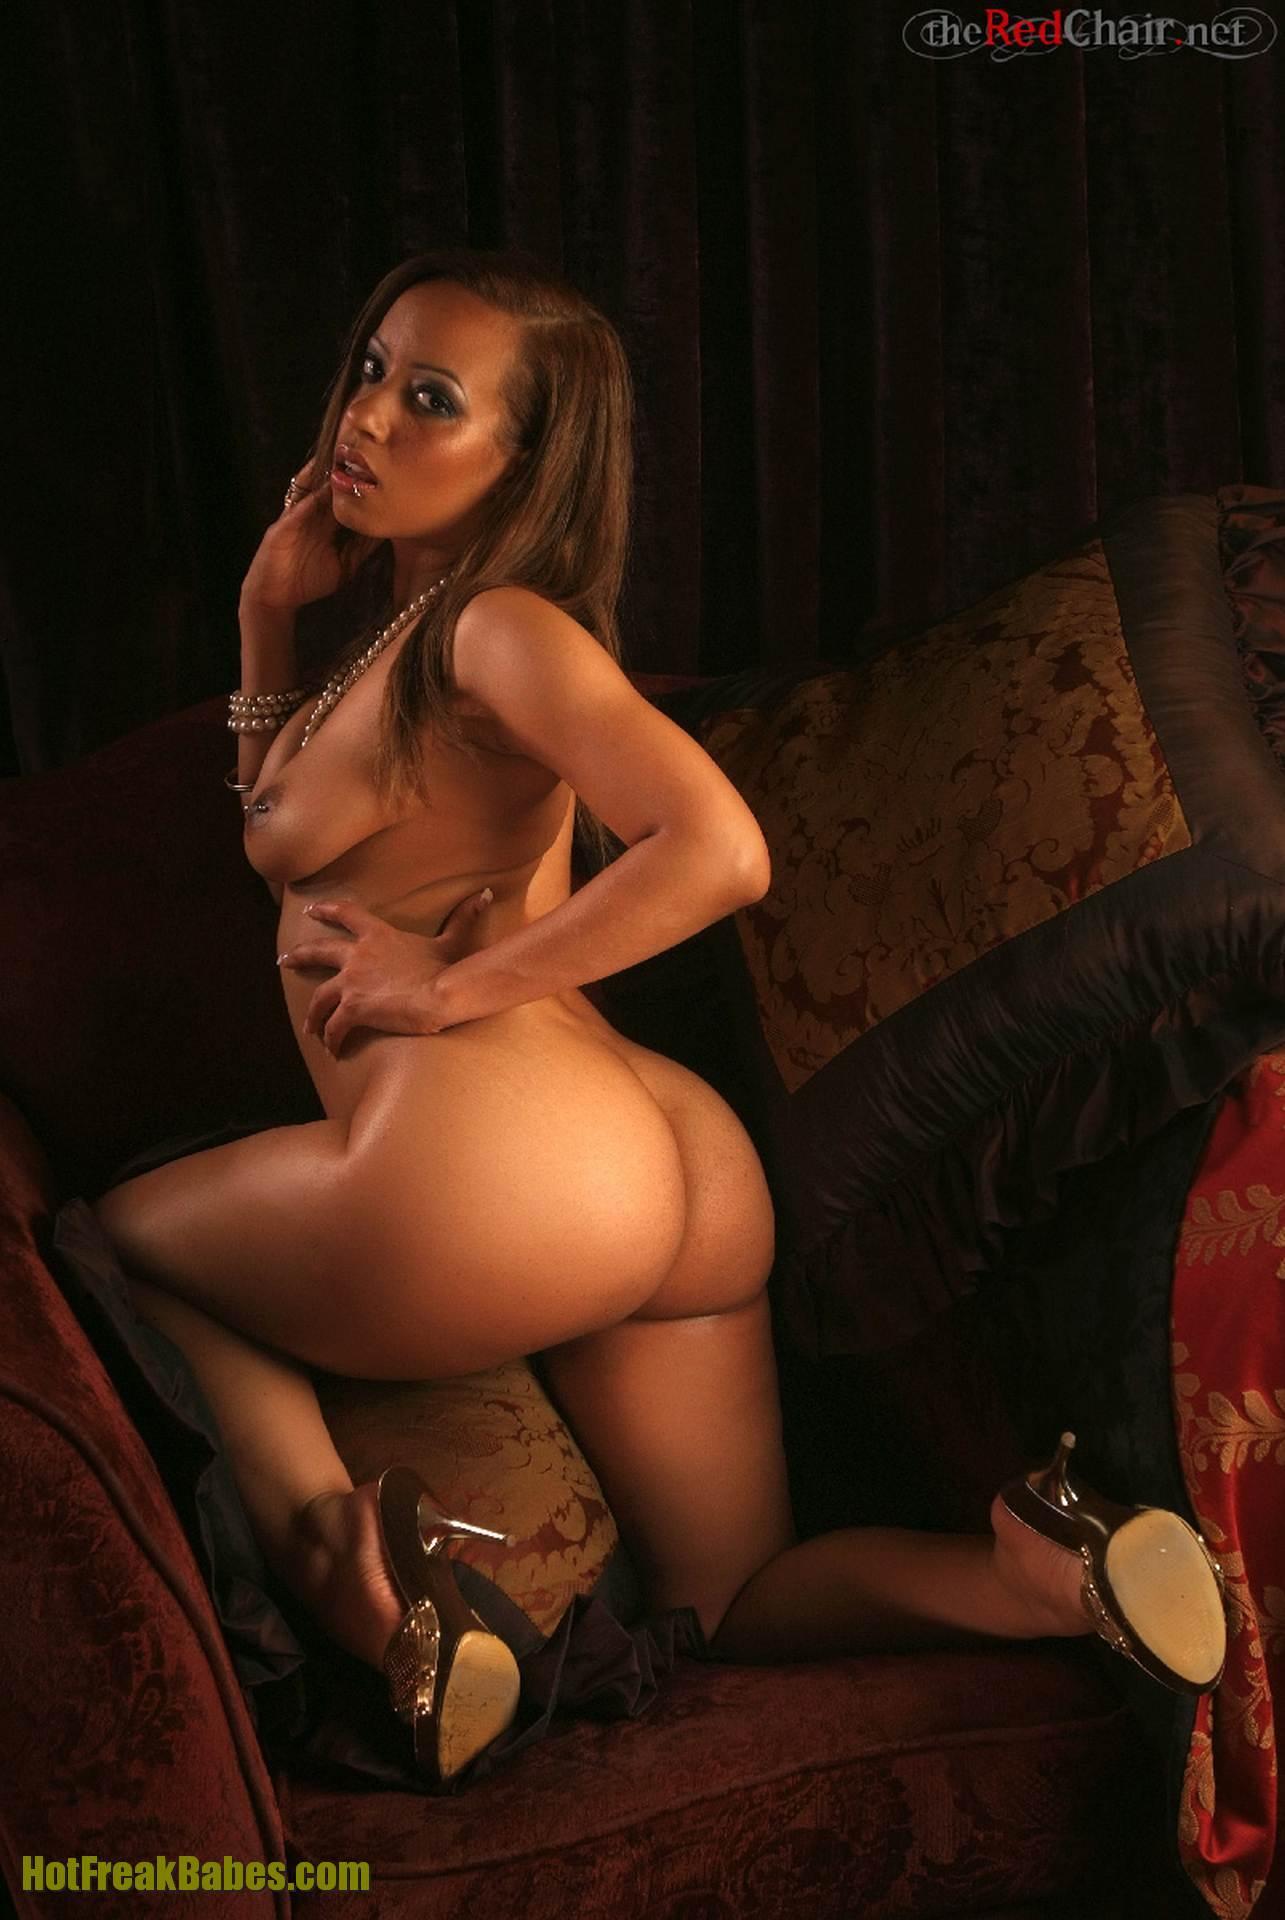 chelsea houska nude pics